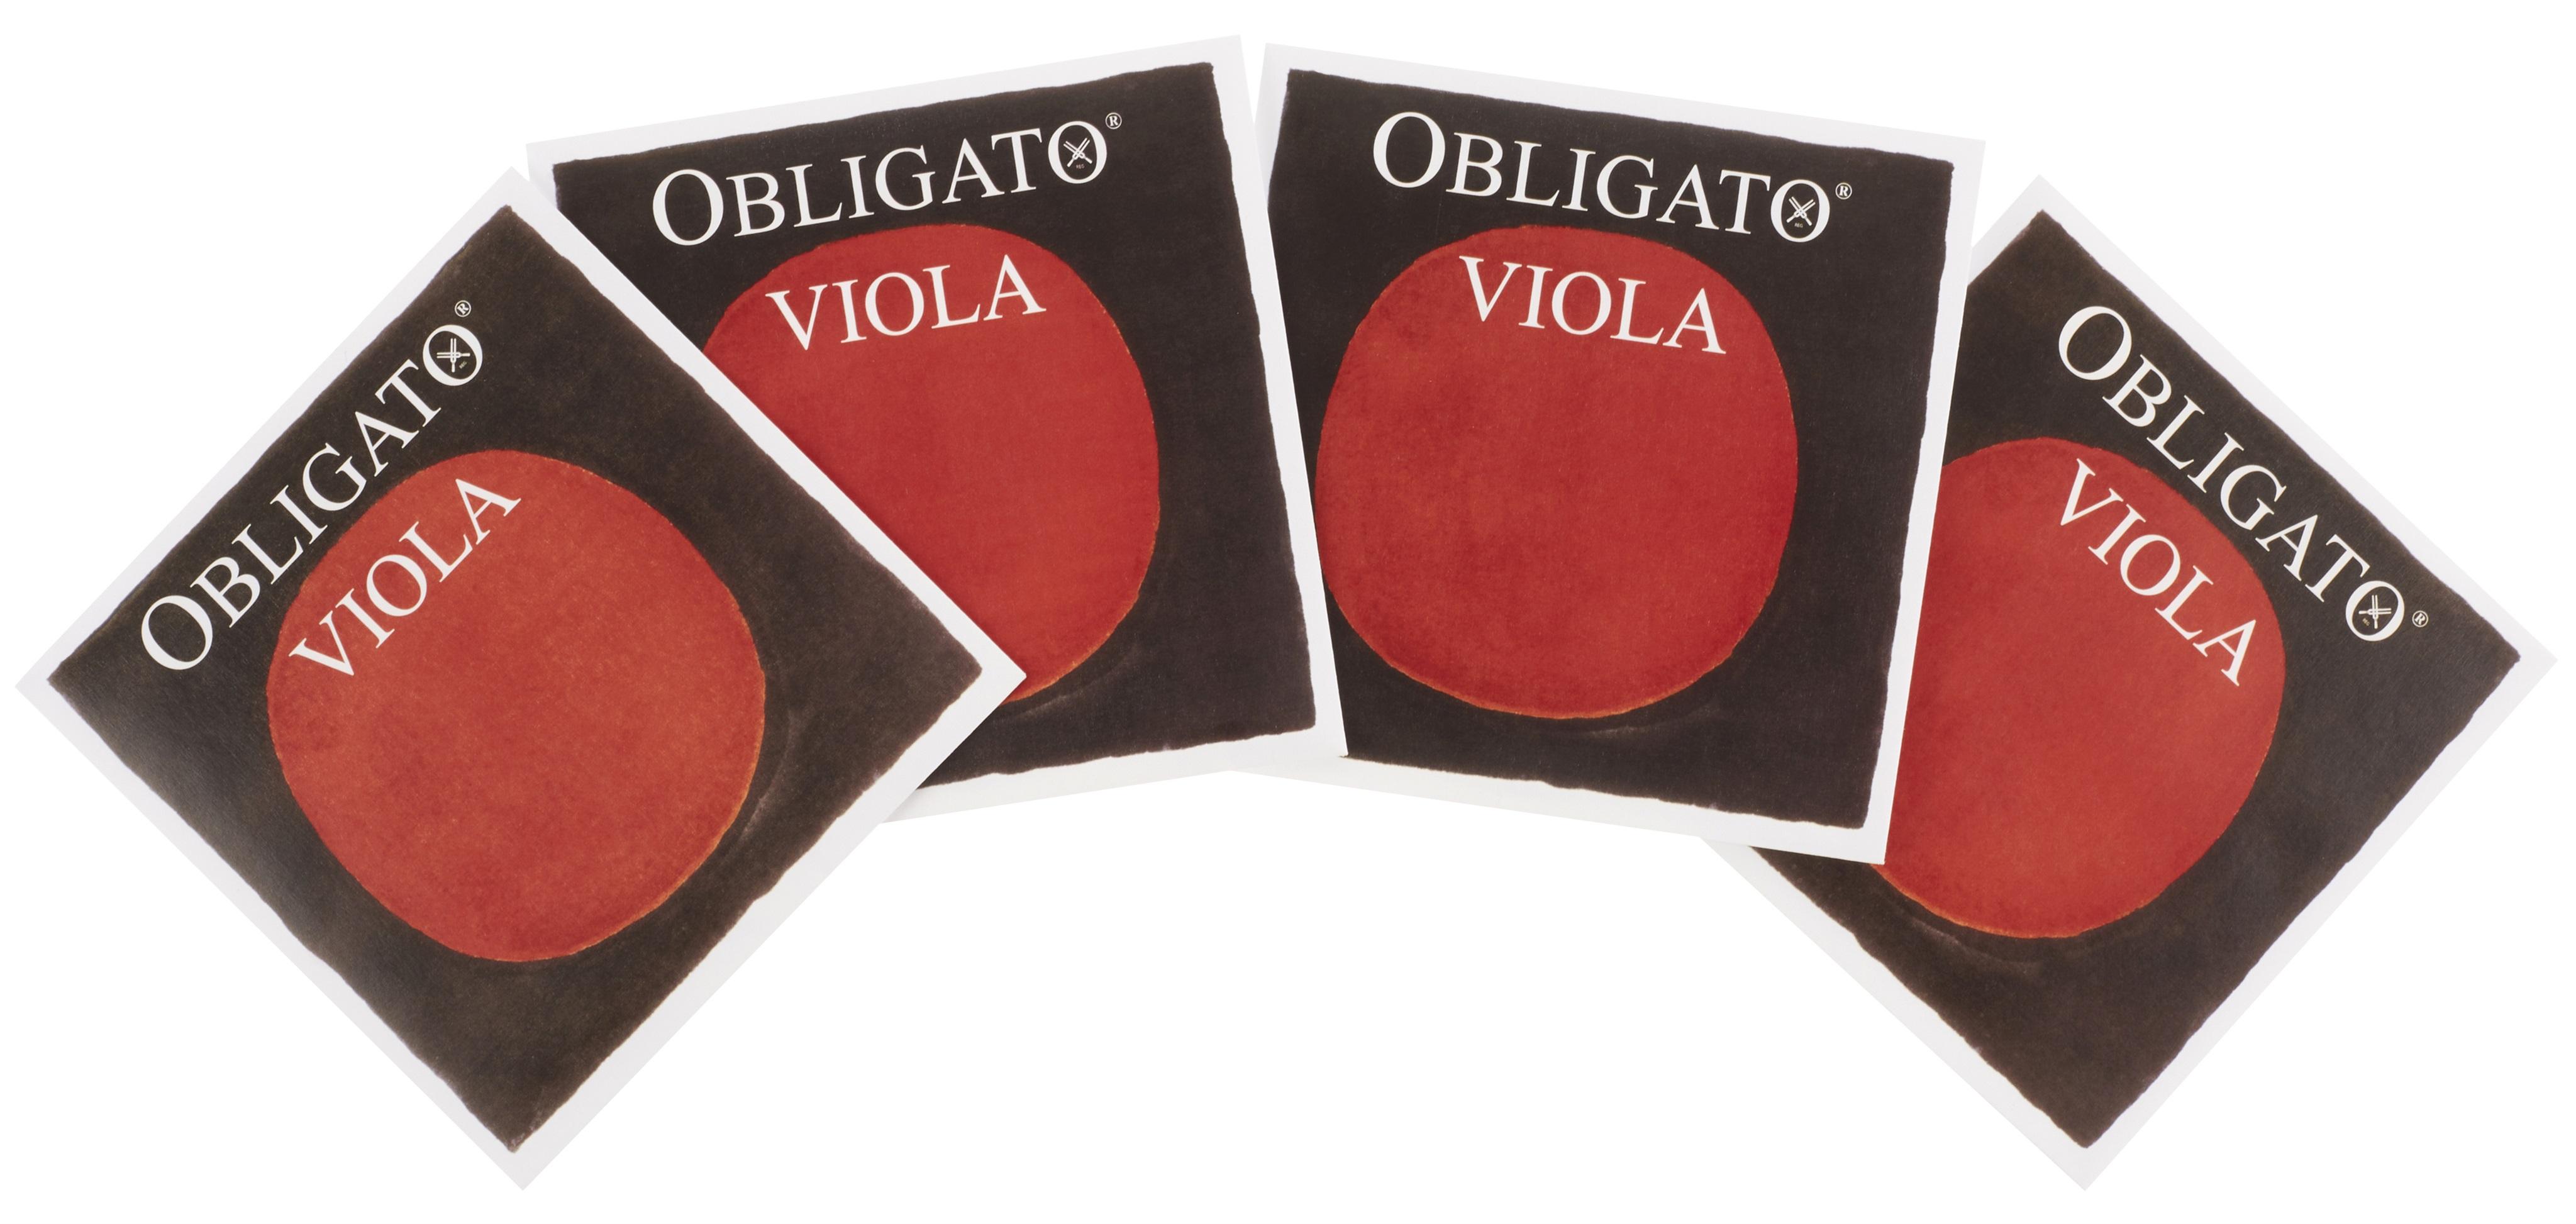 Pirastro Obligato Vla Set medium